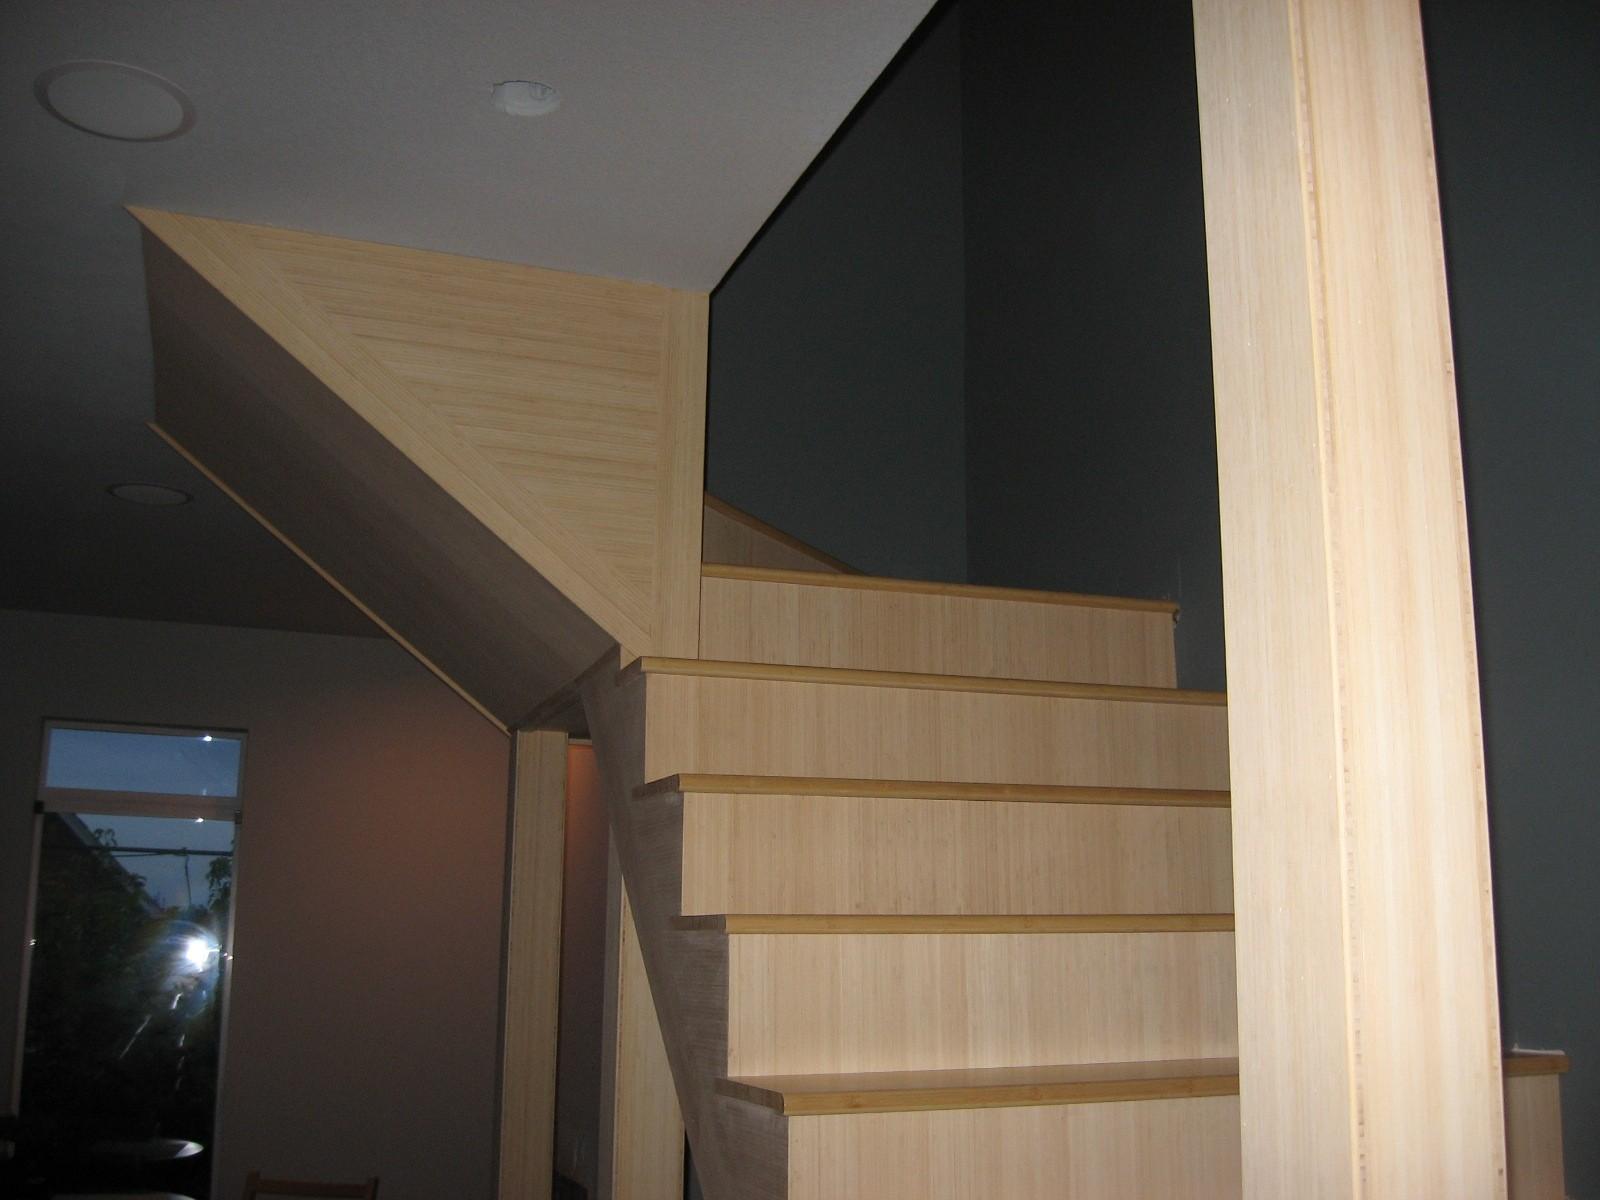 bamboo-stair-4.jpg